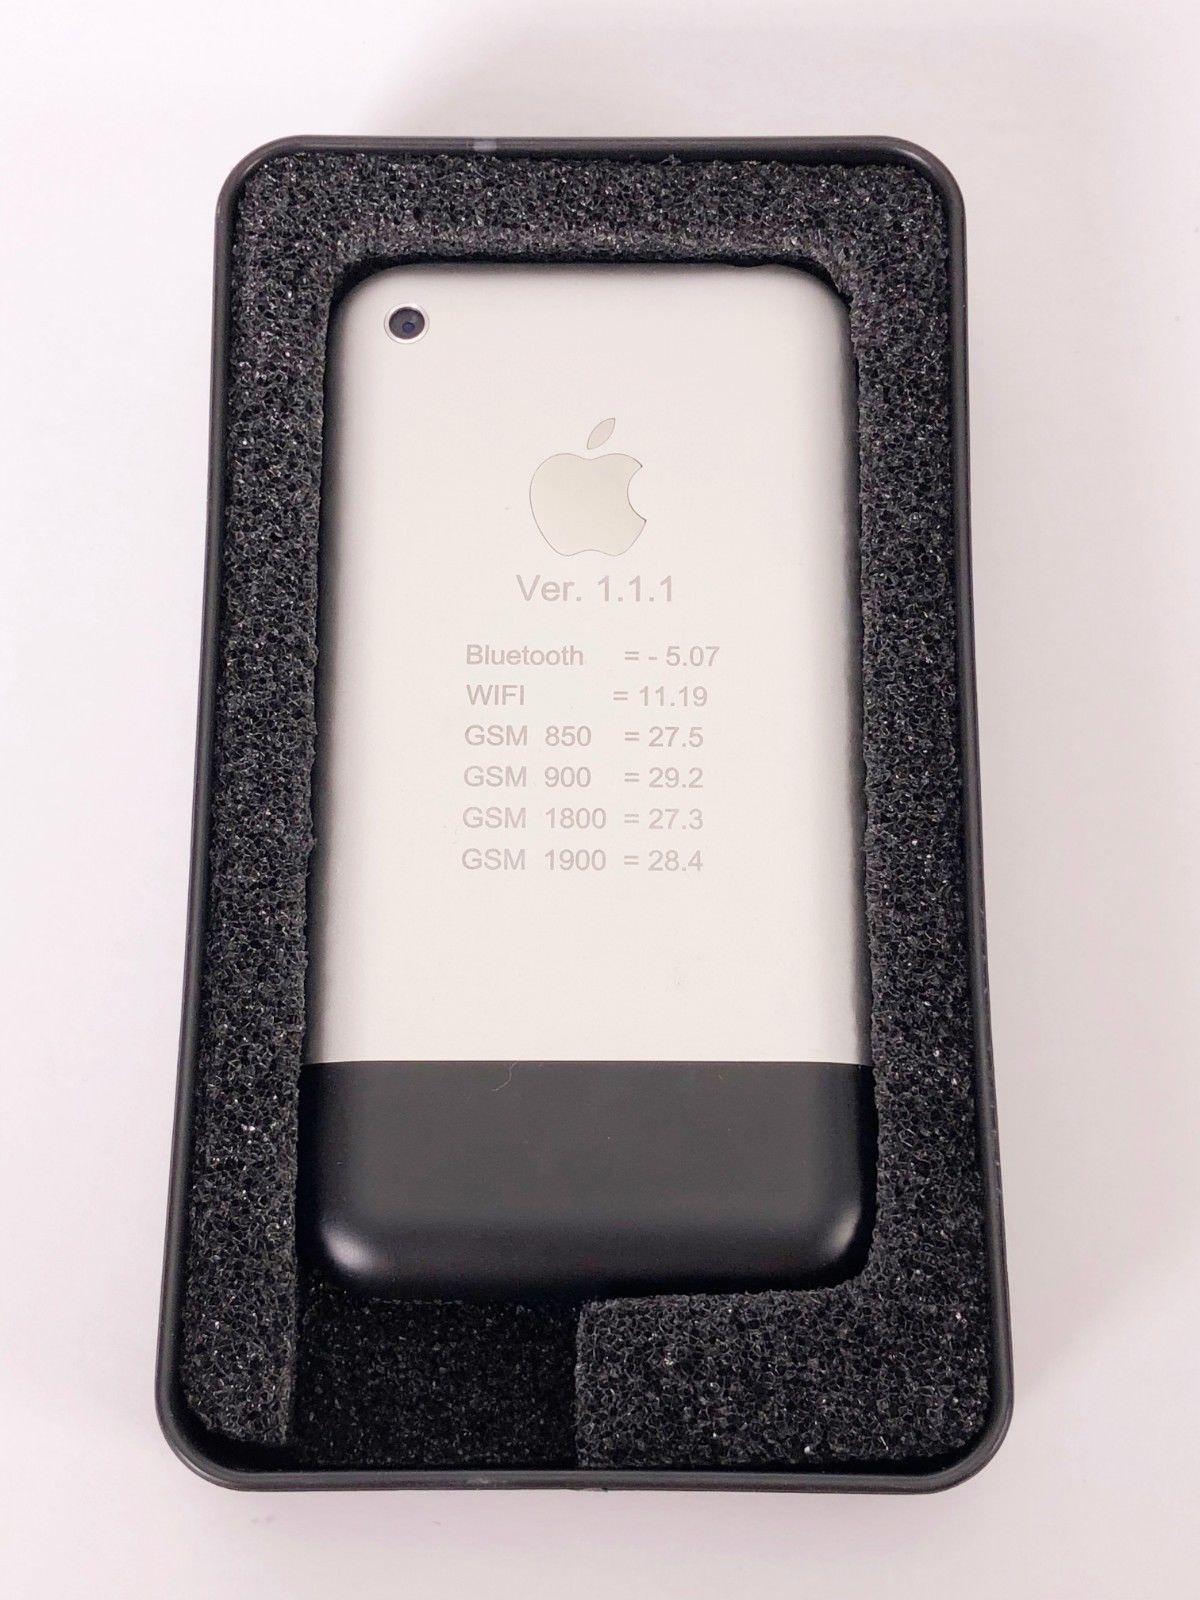 Prototype-Original-iPhone-on-ebay-3.jpg